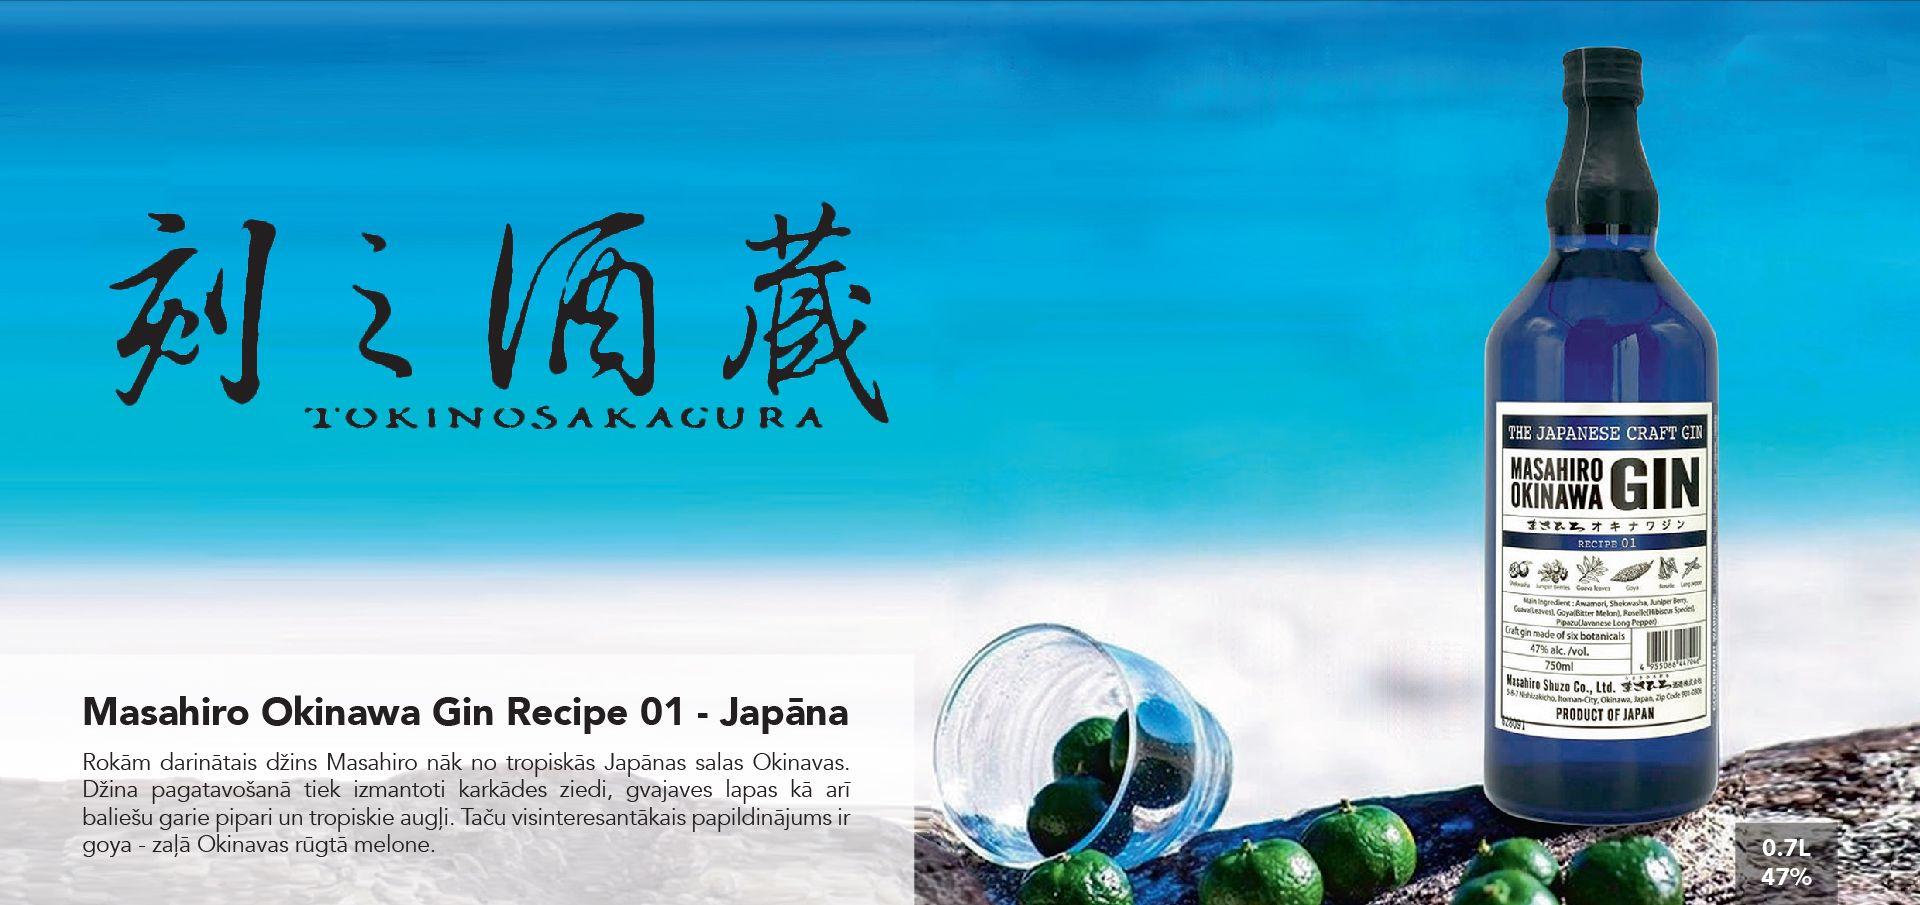 Masahiro Okinawa Gin Recipe 01 - Japāna